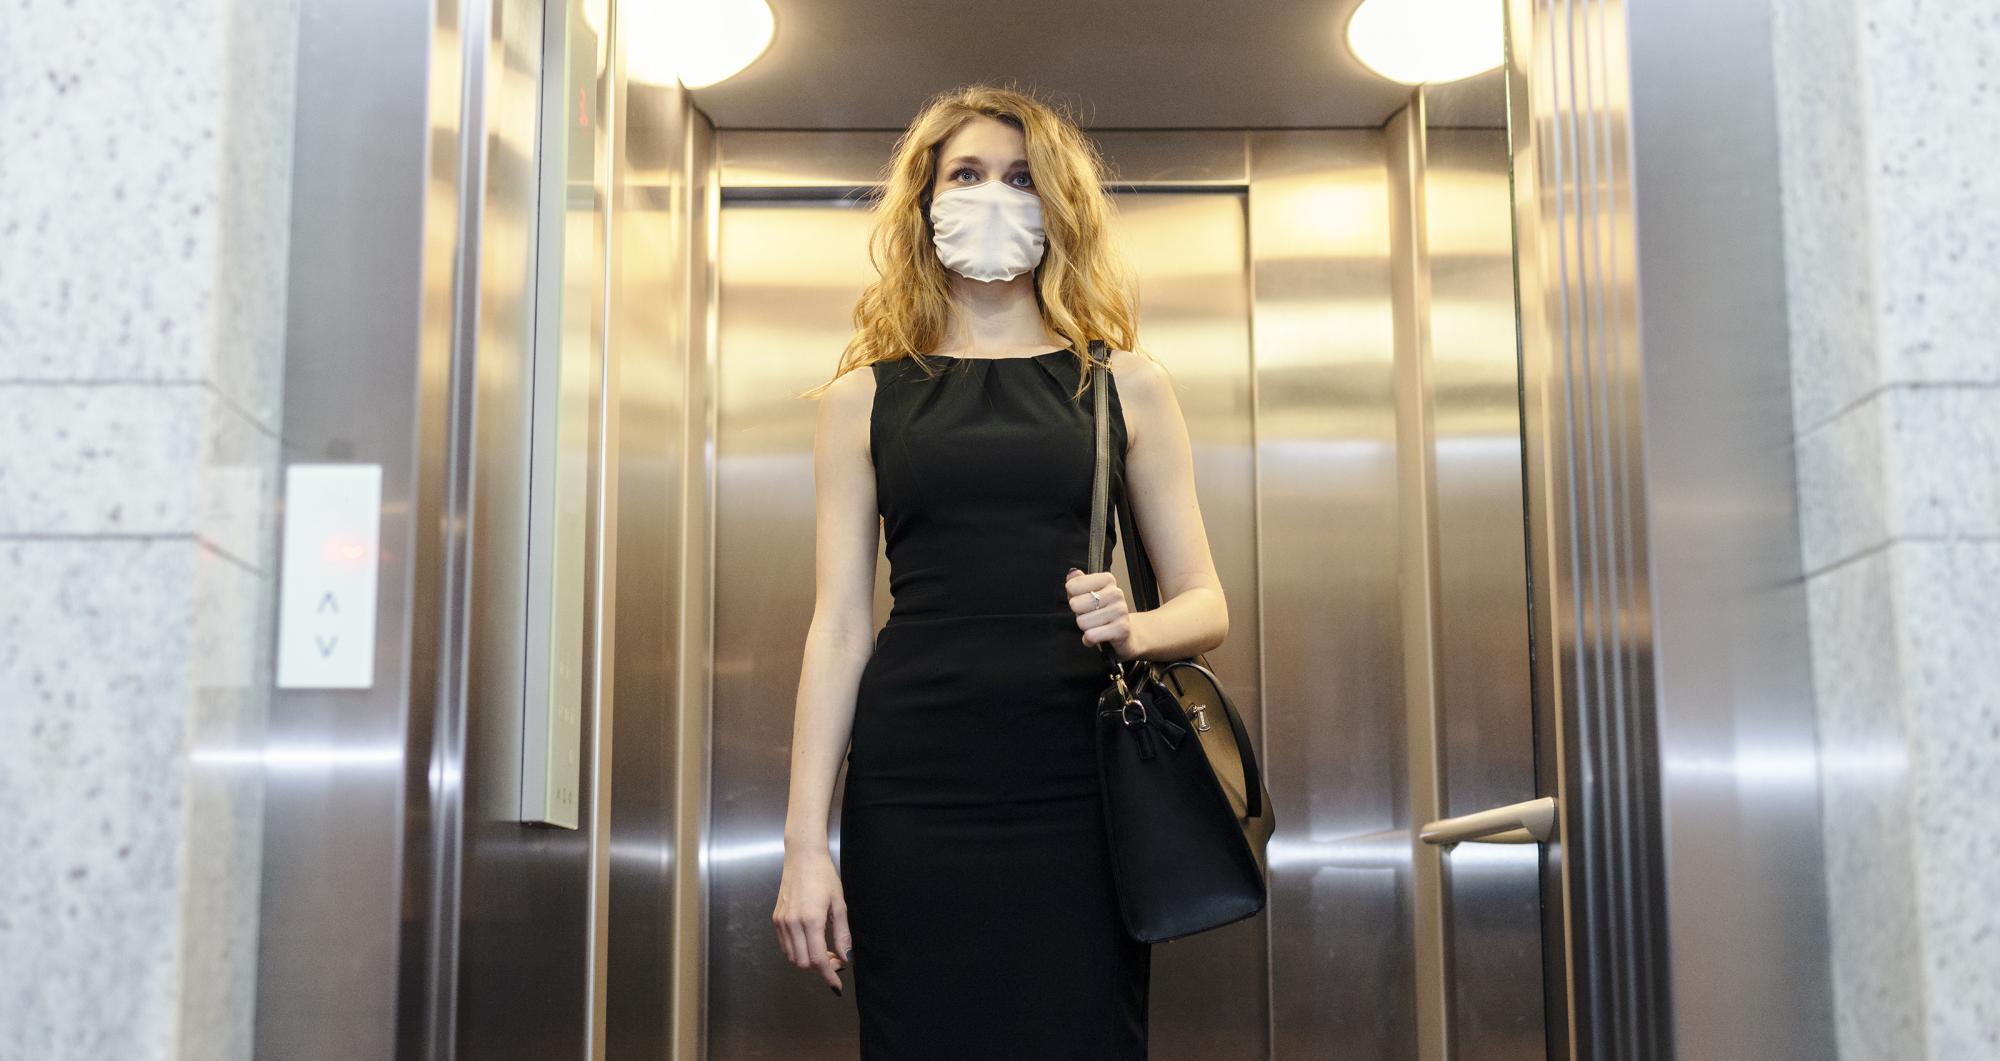 Schone lucht in liften